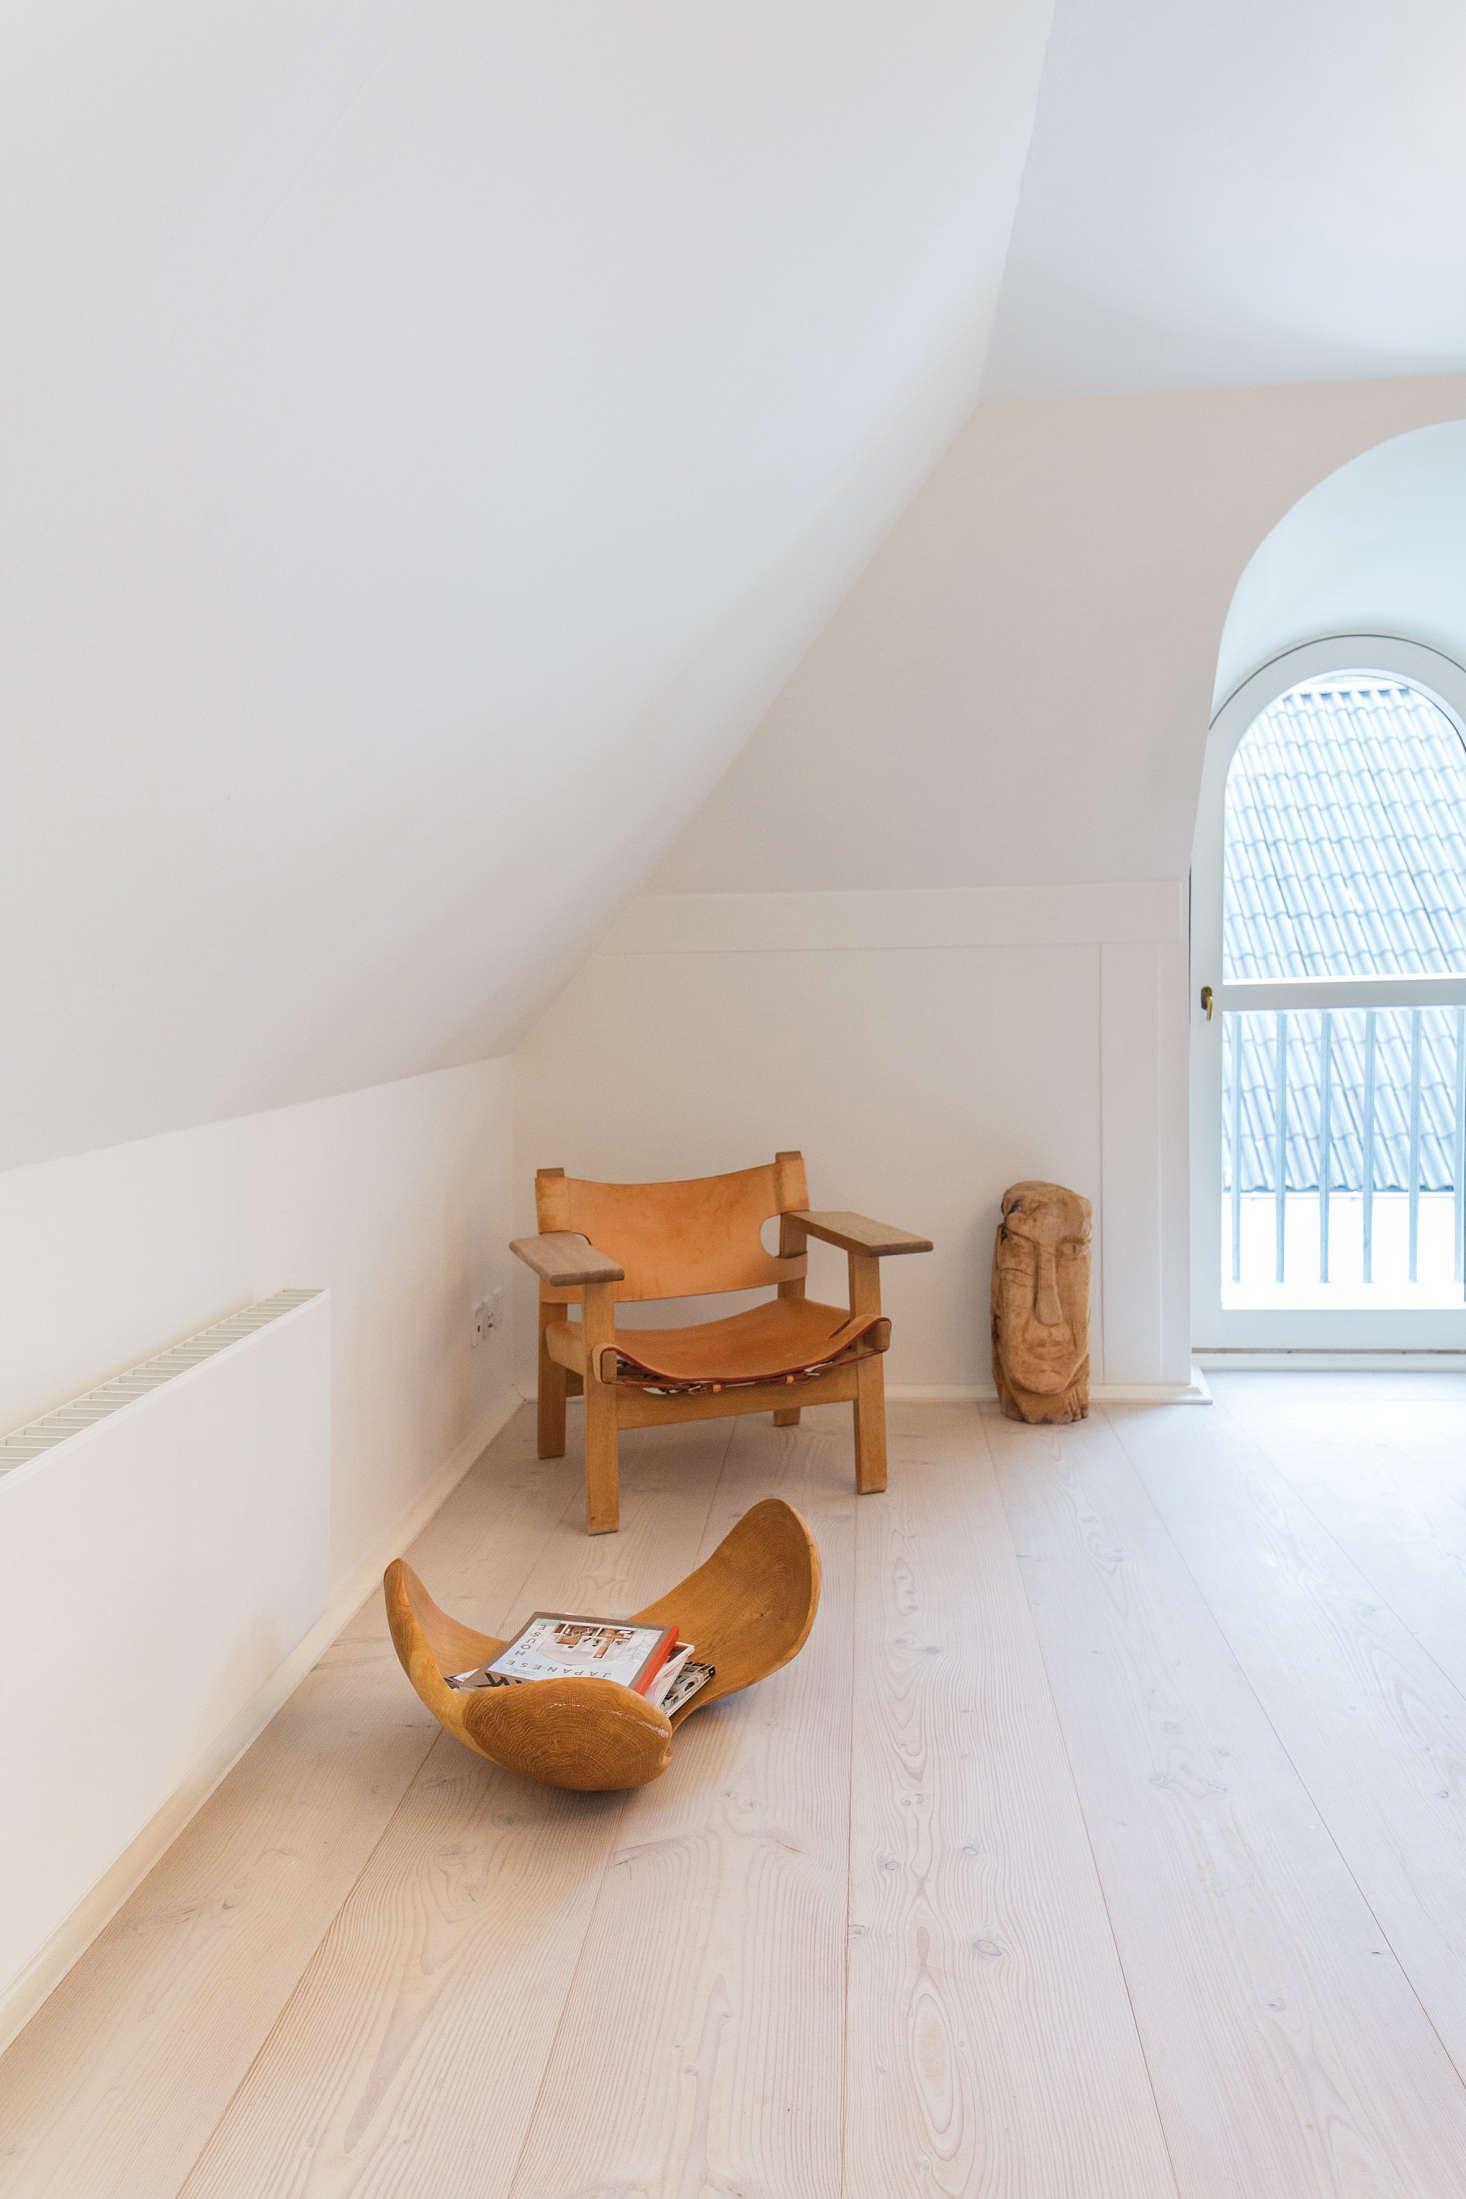 Berühmt Dinesen Douglasie Bilder - Innenarchitektur Kollektion ...